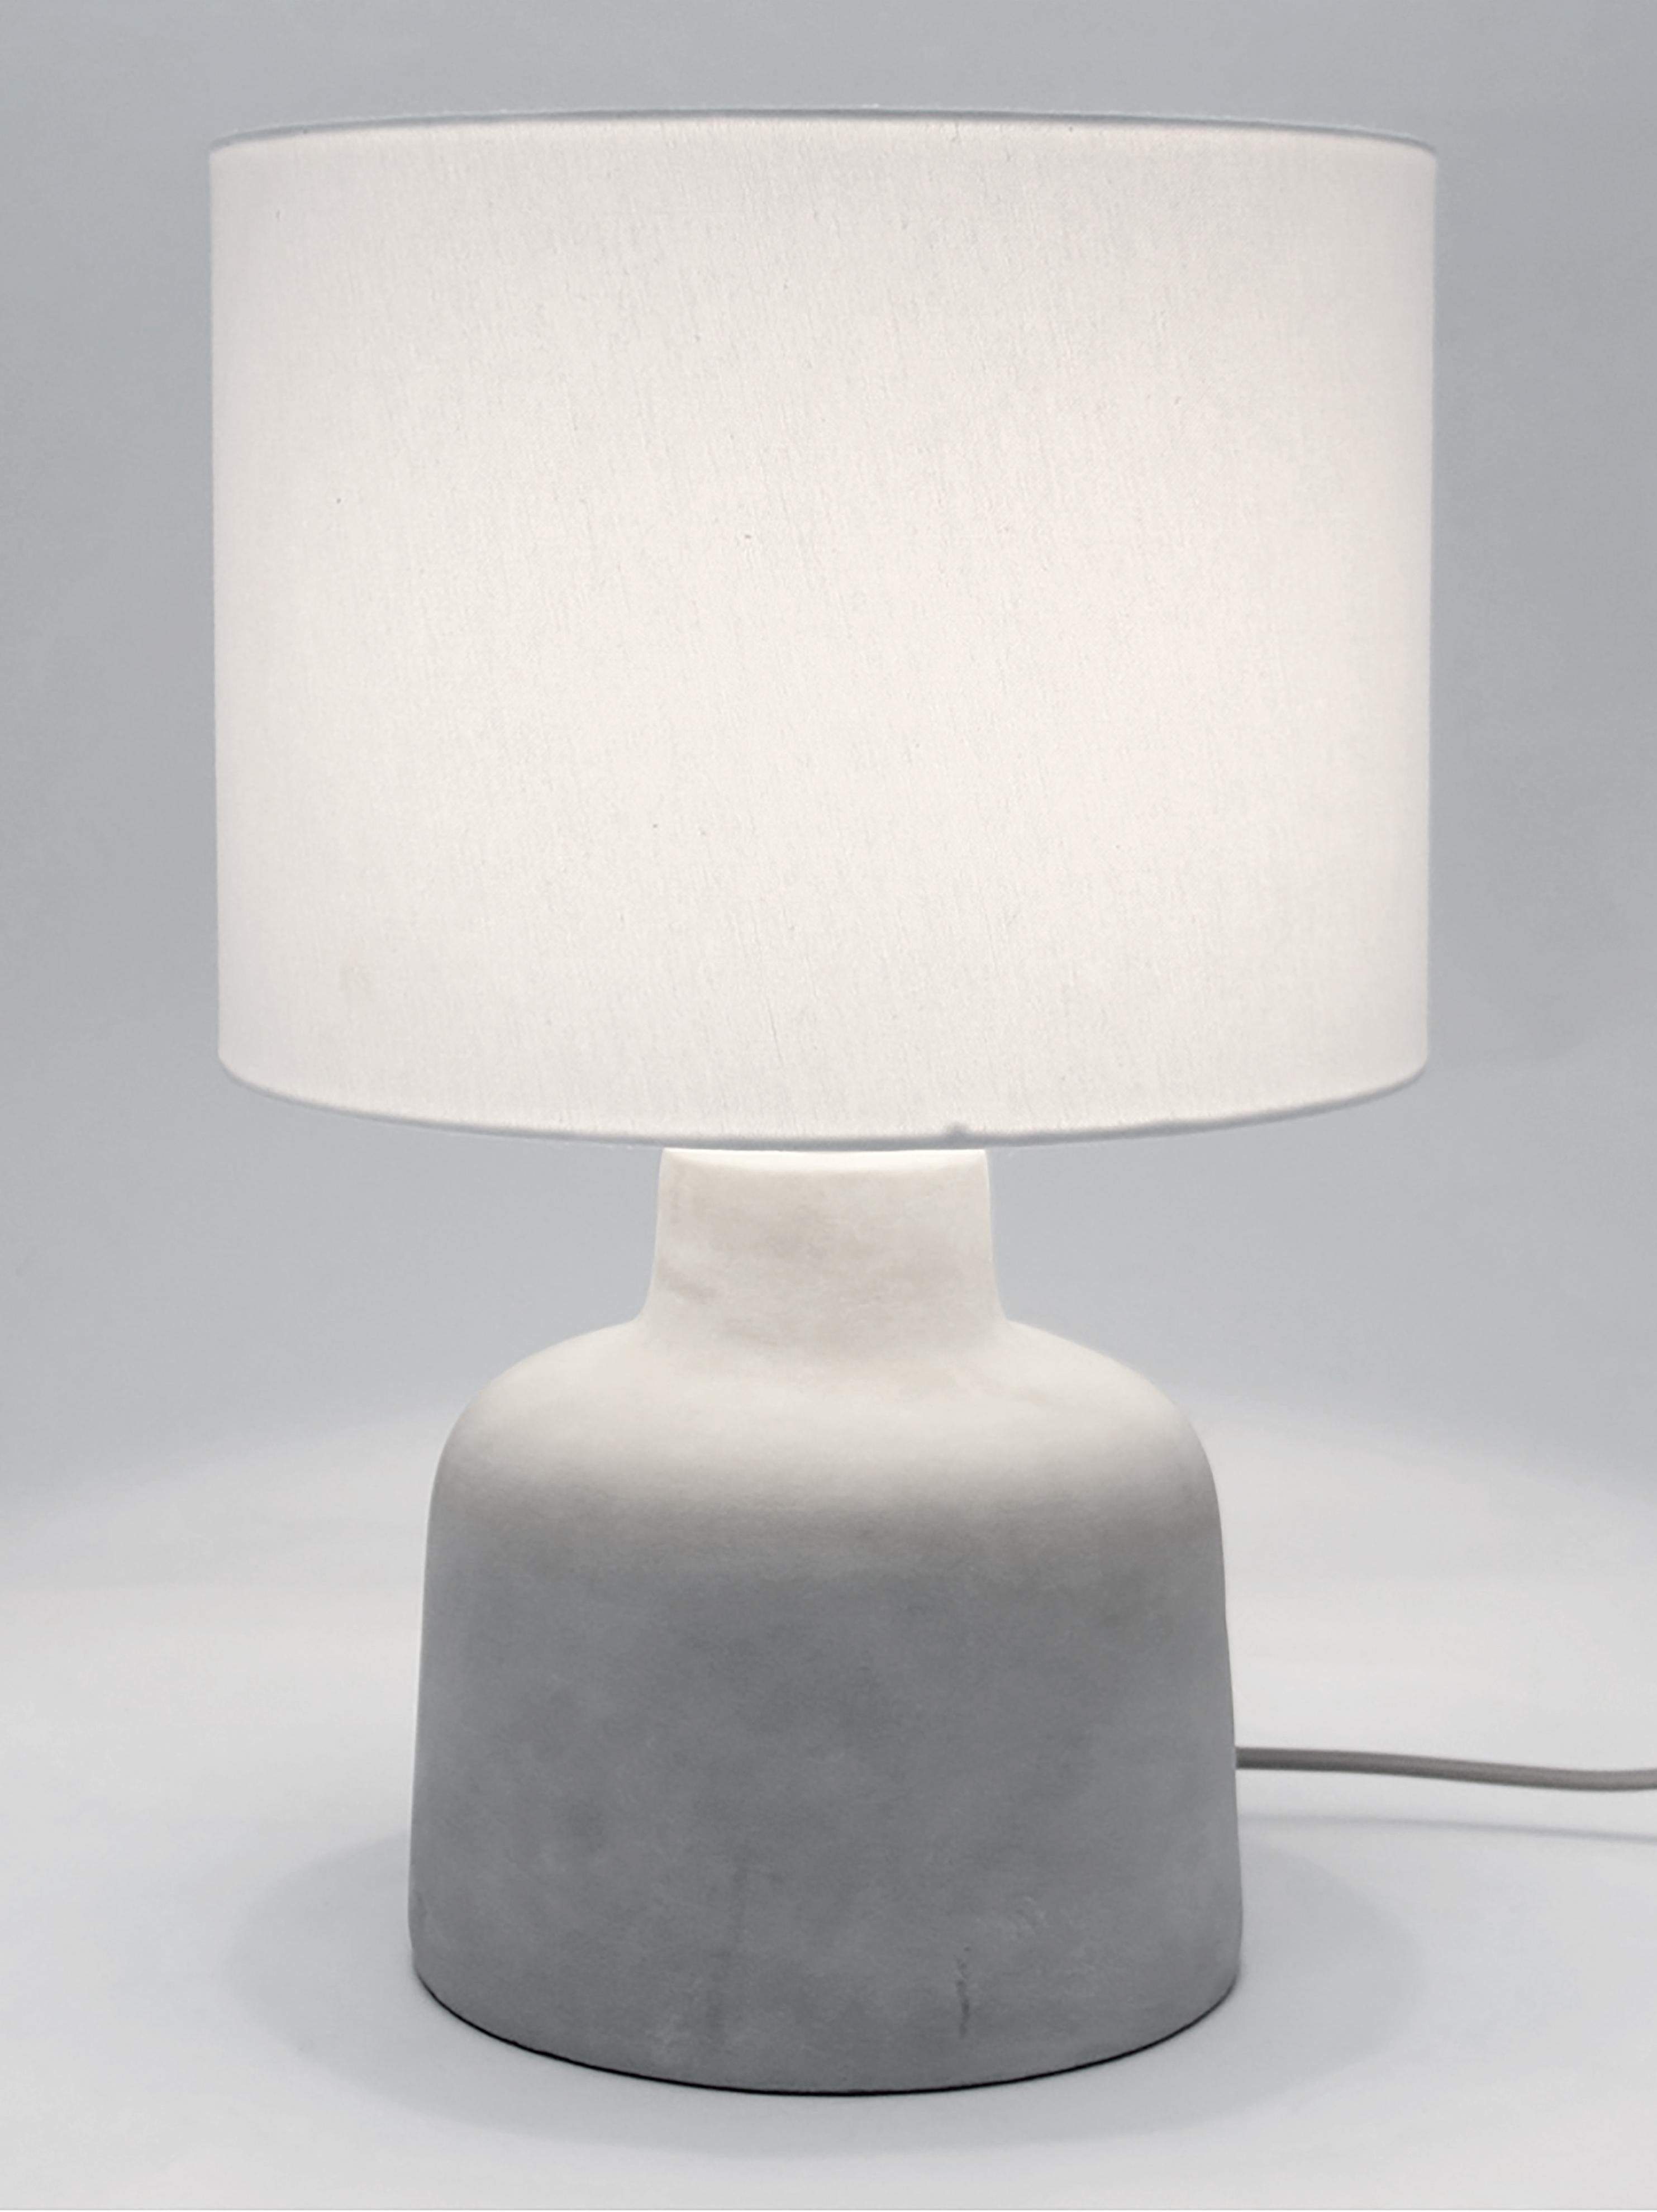 Lampe à poser en béton Ike, Béton, blanc